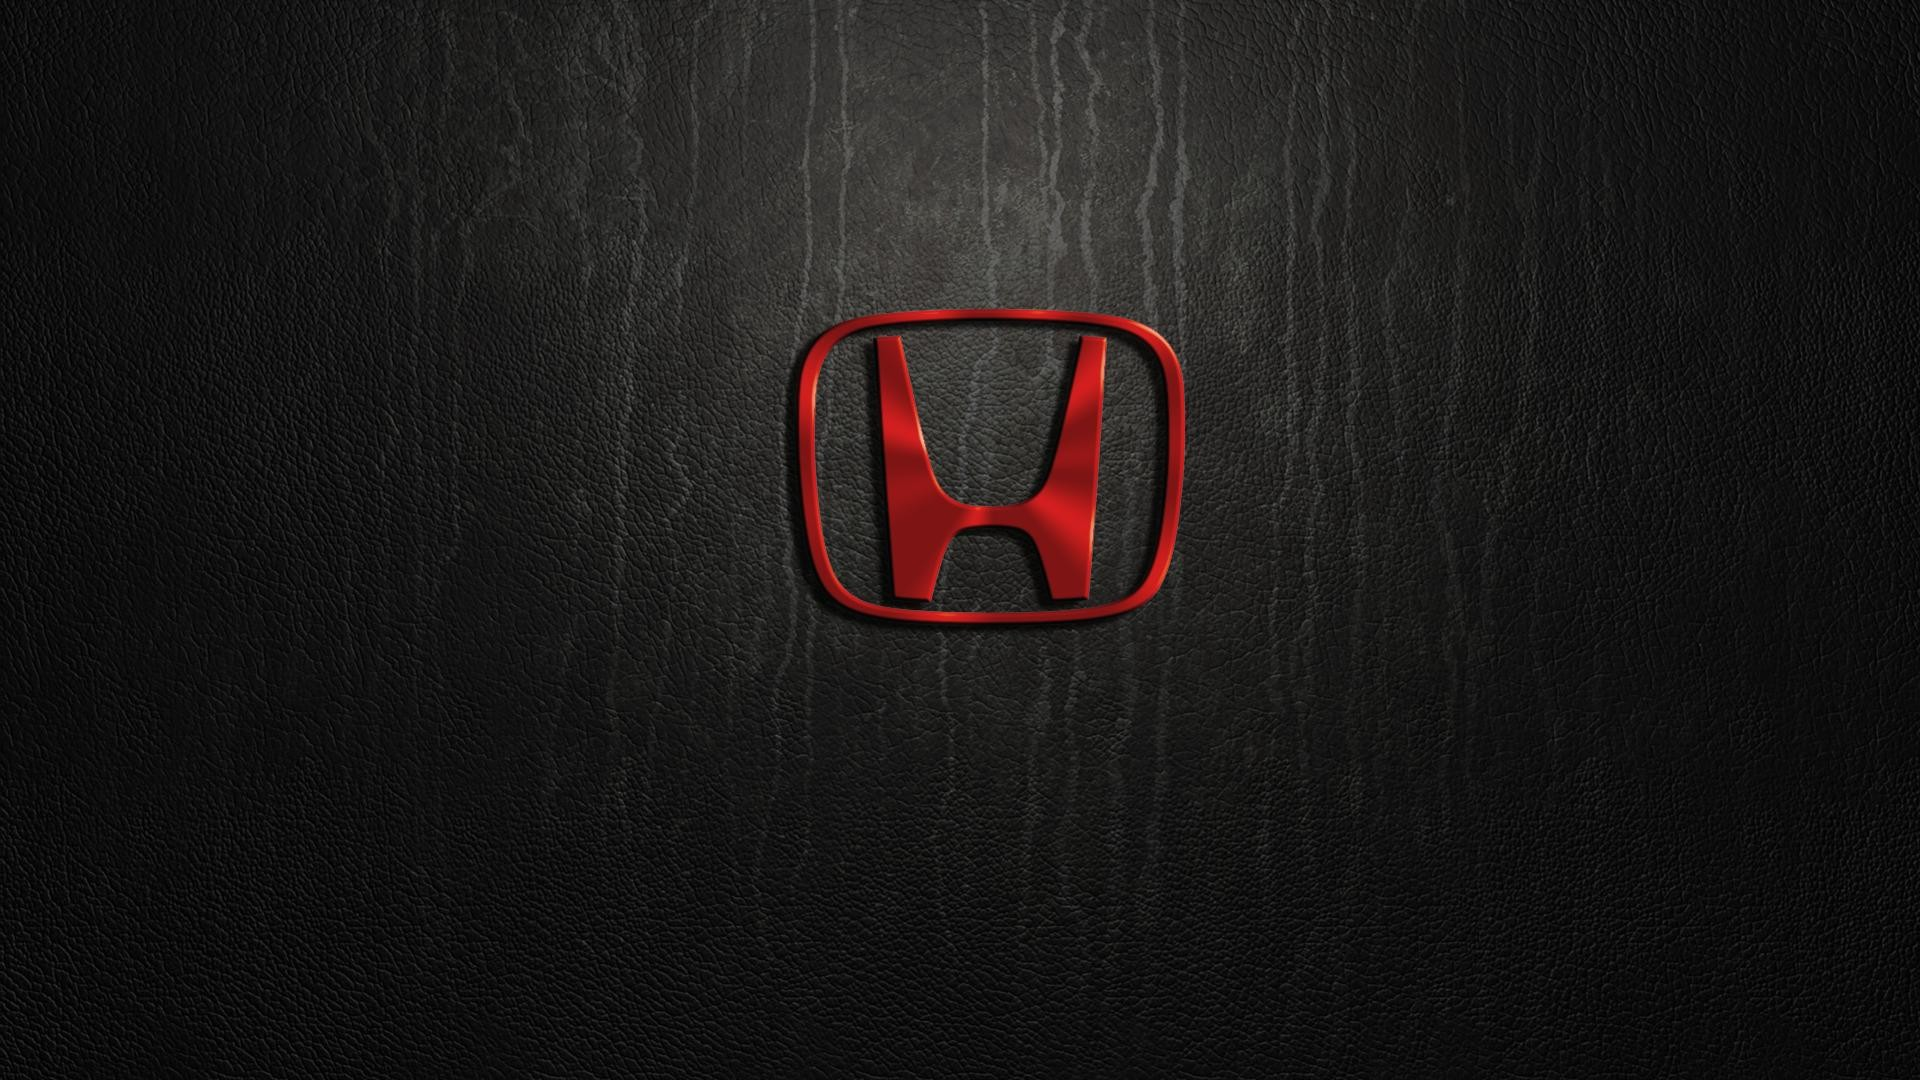 1920x1080 Honda Wallpaper Logo Cars Wallpapers HD